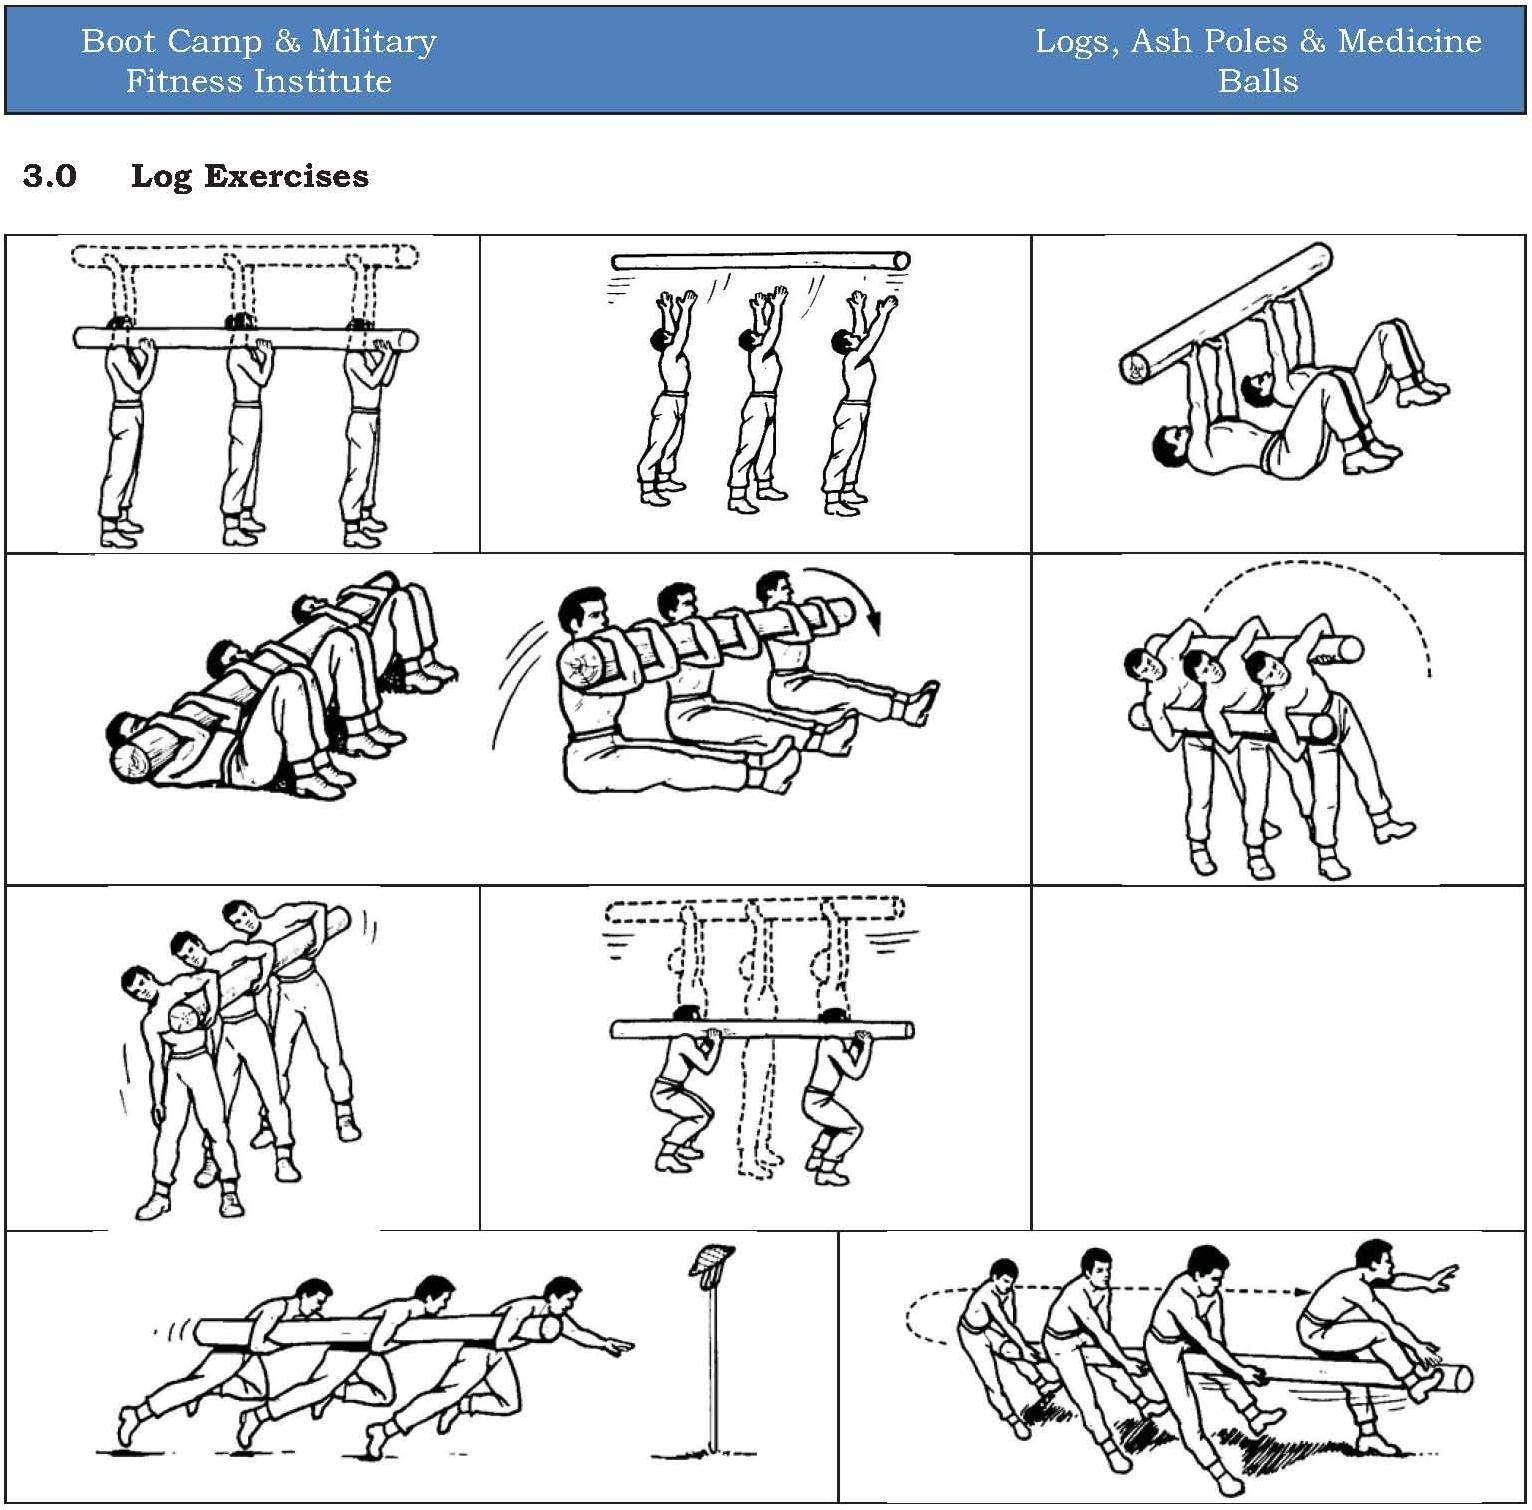 Logs, Ash Poles & Medicine Balls – Boot Camp & Military Fitness